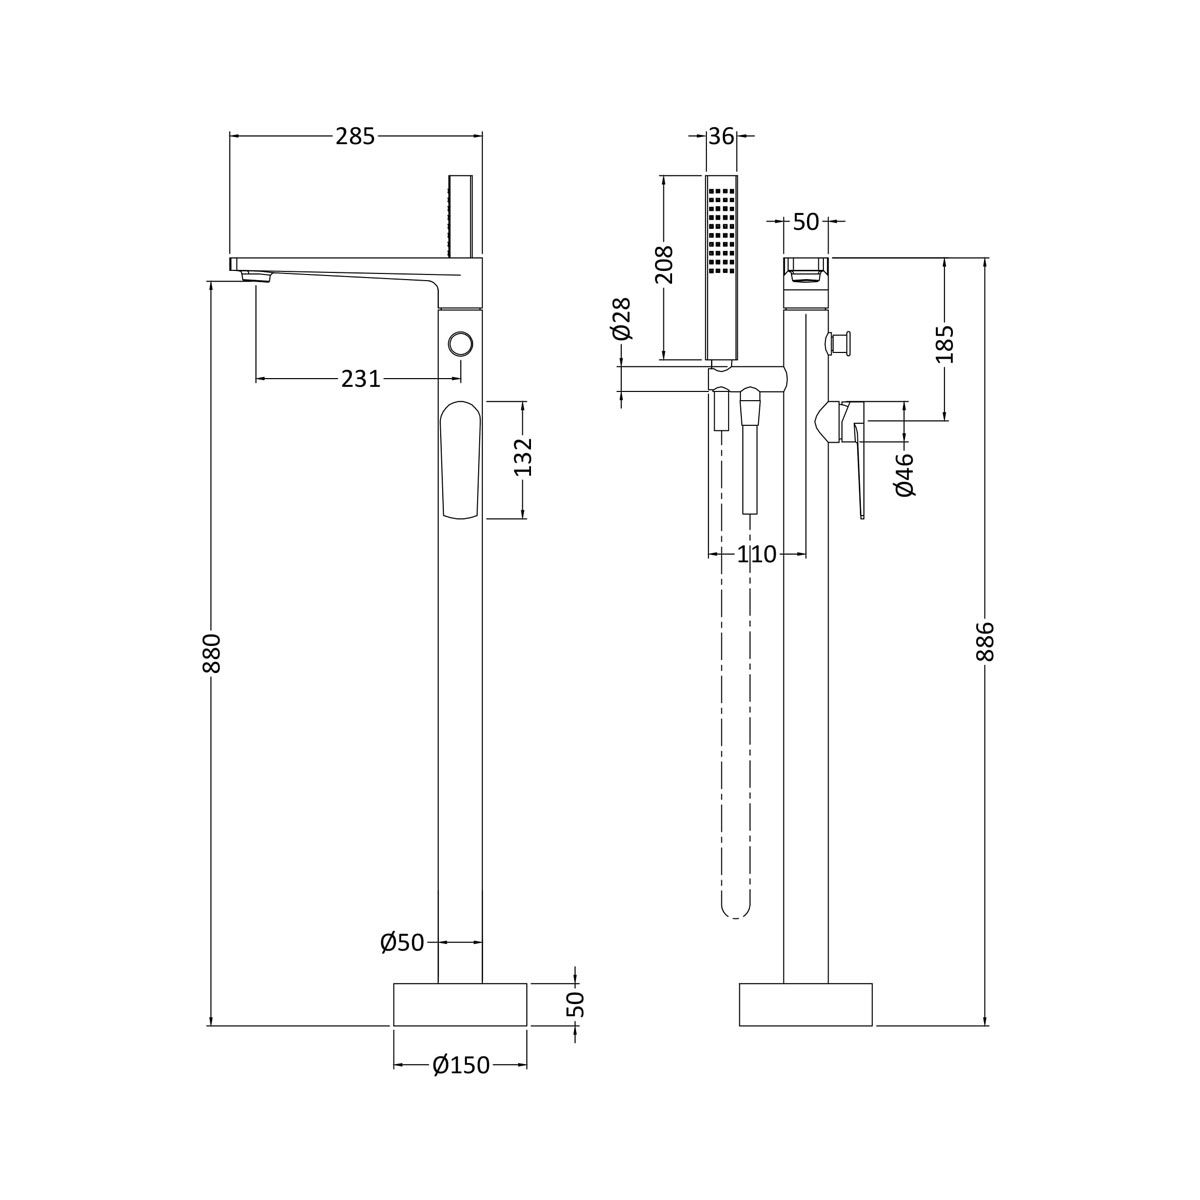 Nuie Bailey Floor Standing Bath Shower Mixer Tap Dimensions